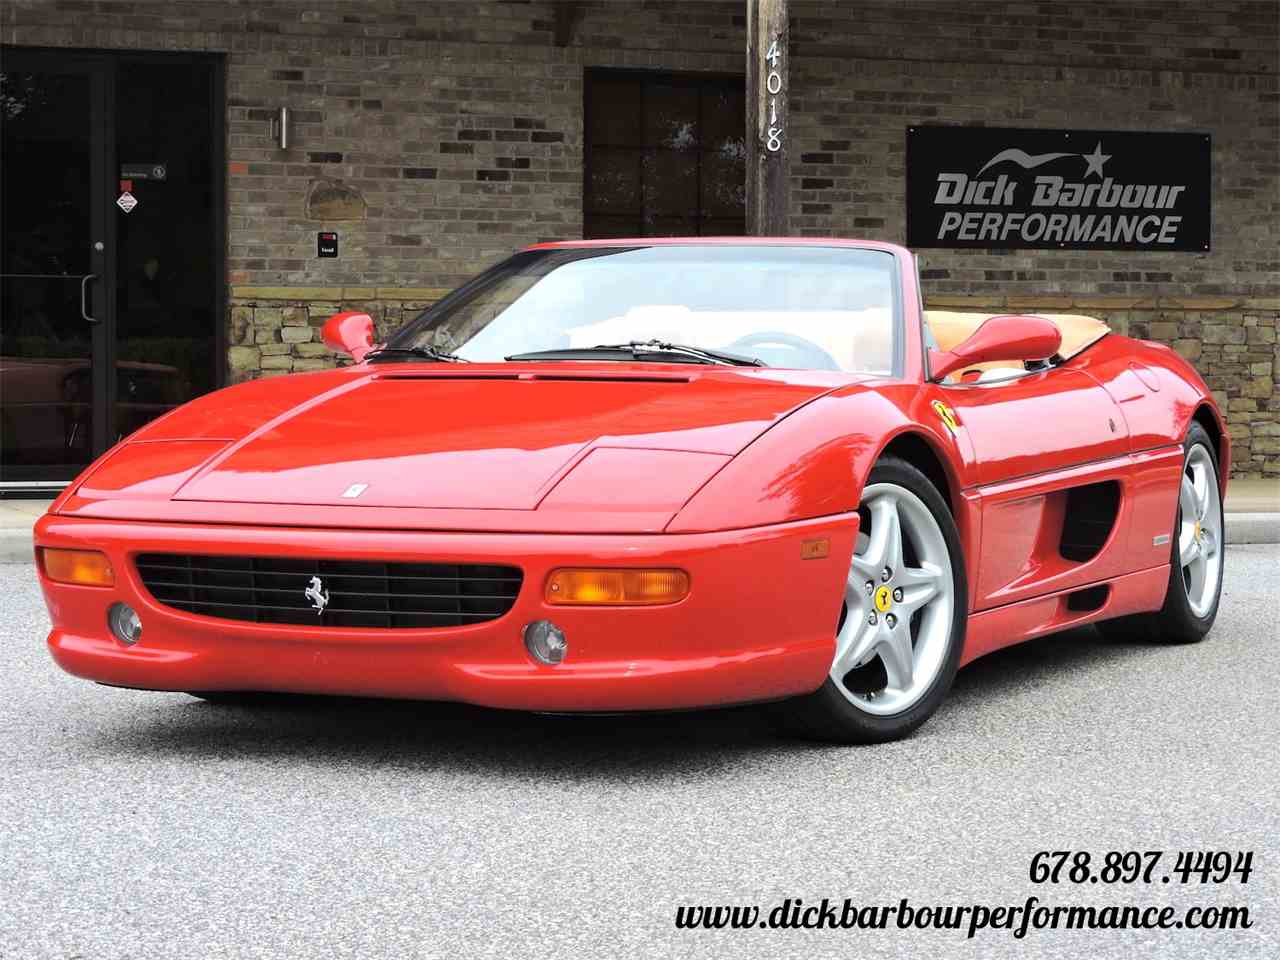 1997 Ferrari 355 for Sale - CC-1019884